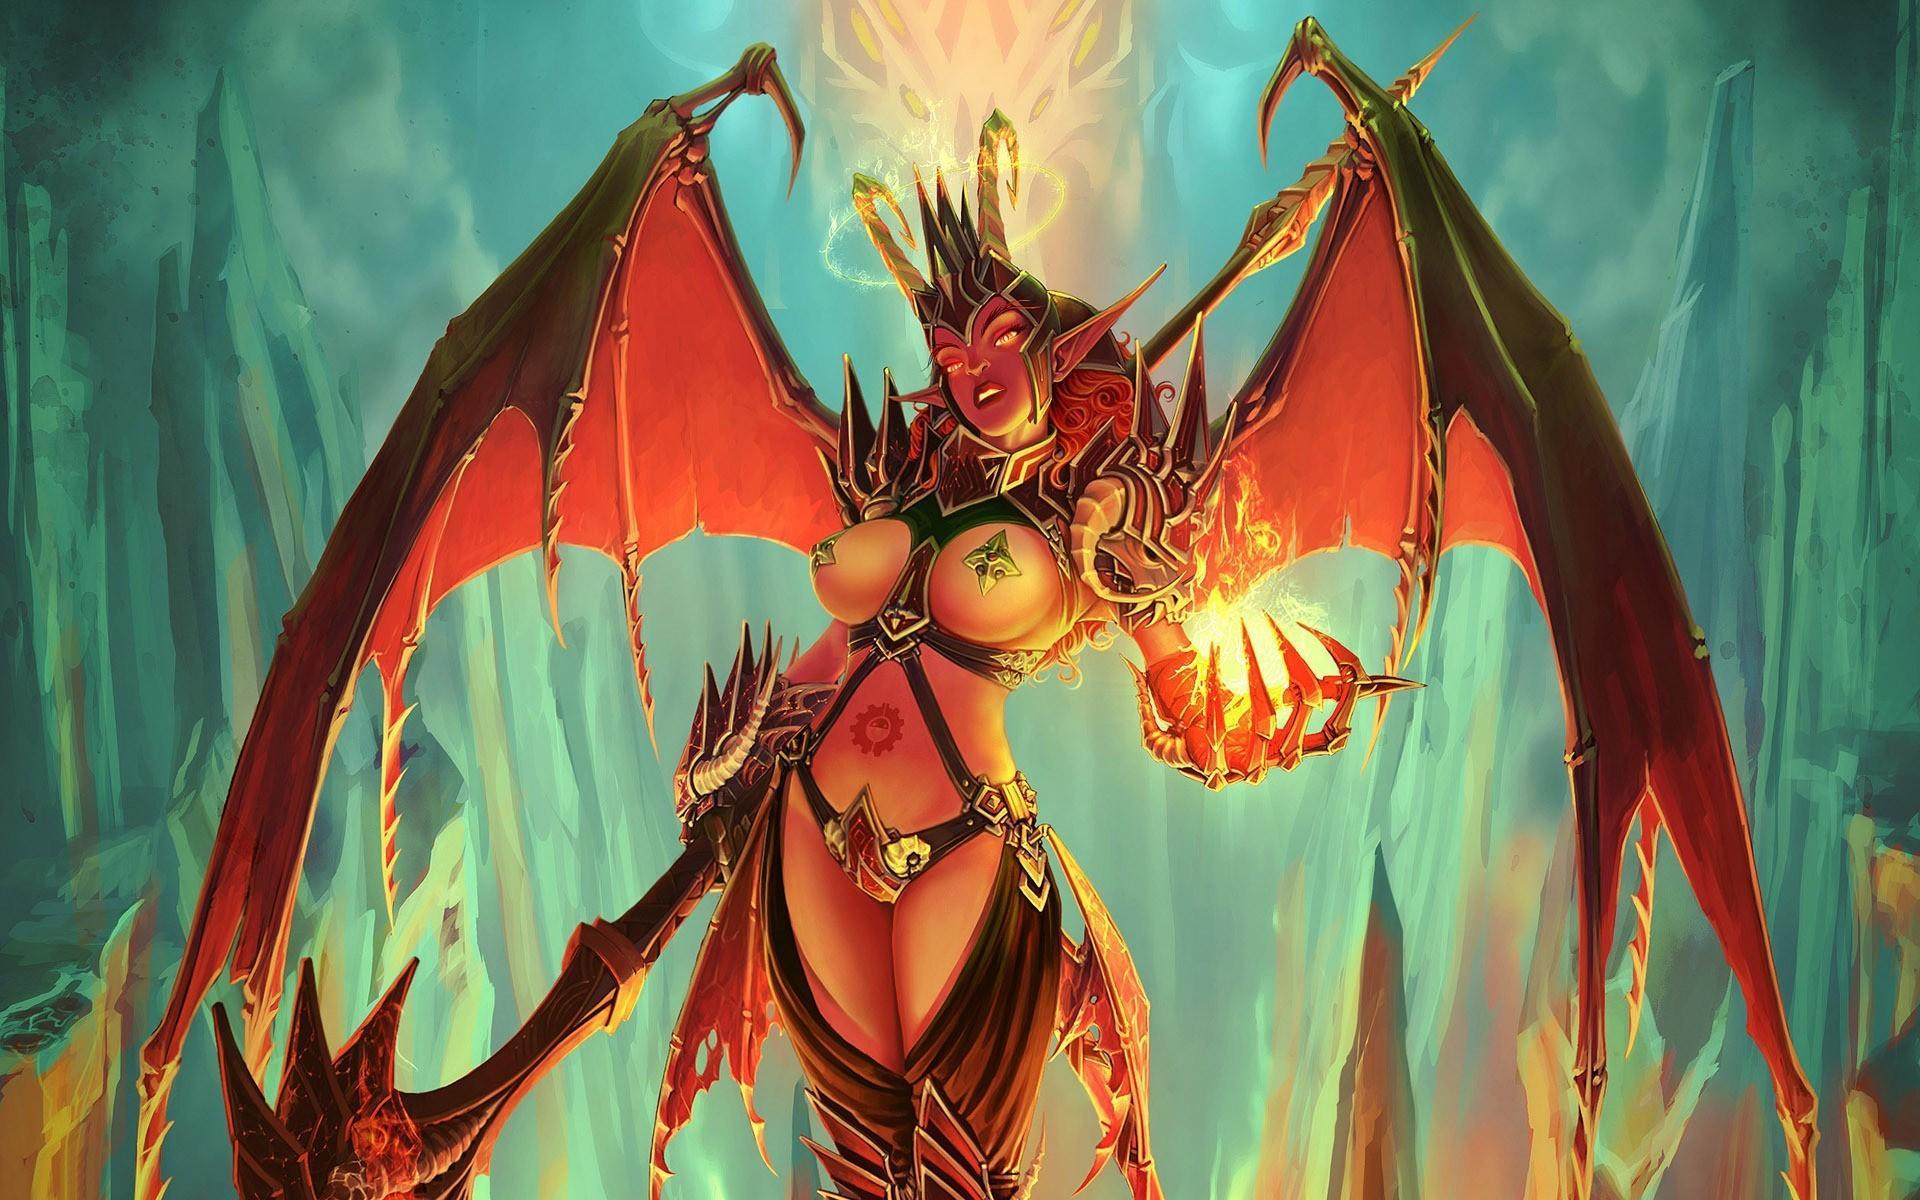 Download sexy devil wallpaper hd backgrounds download itl cat